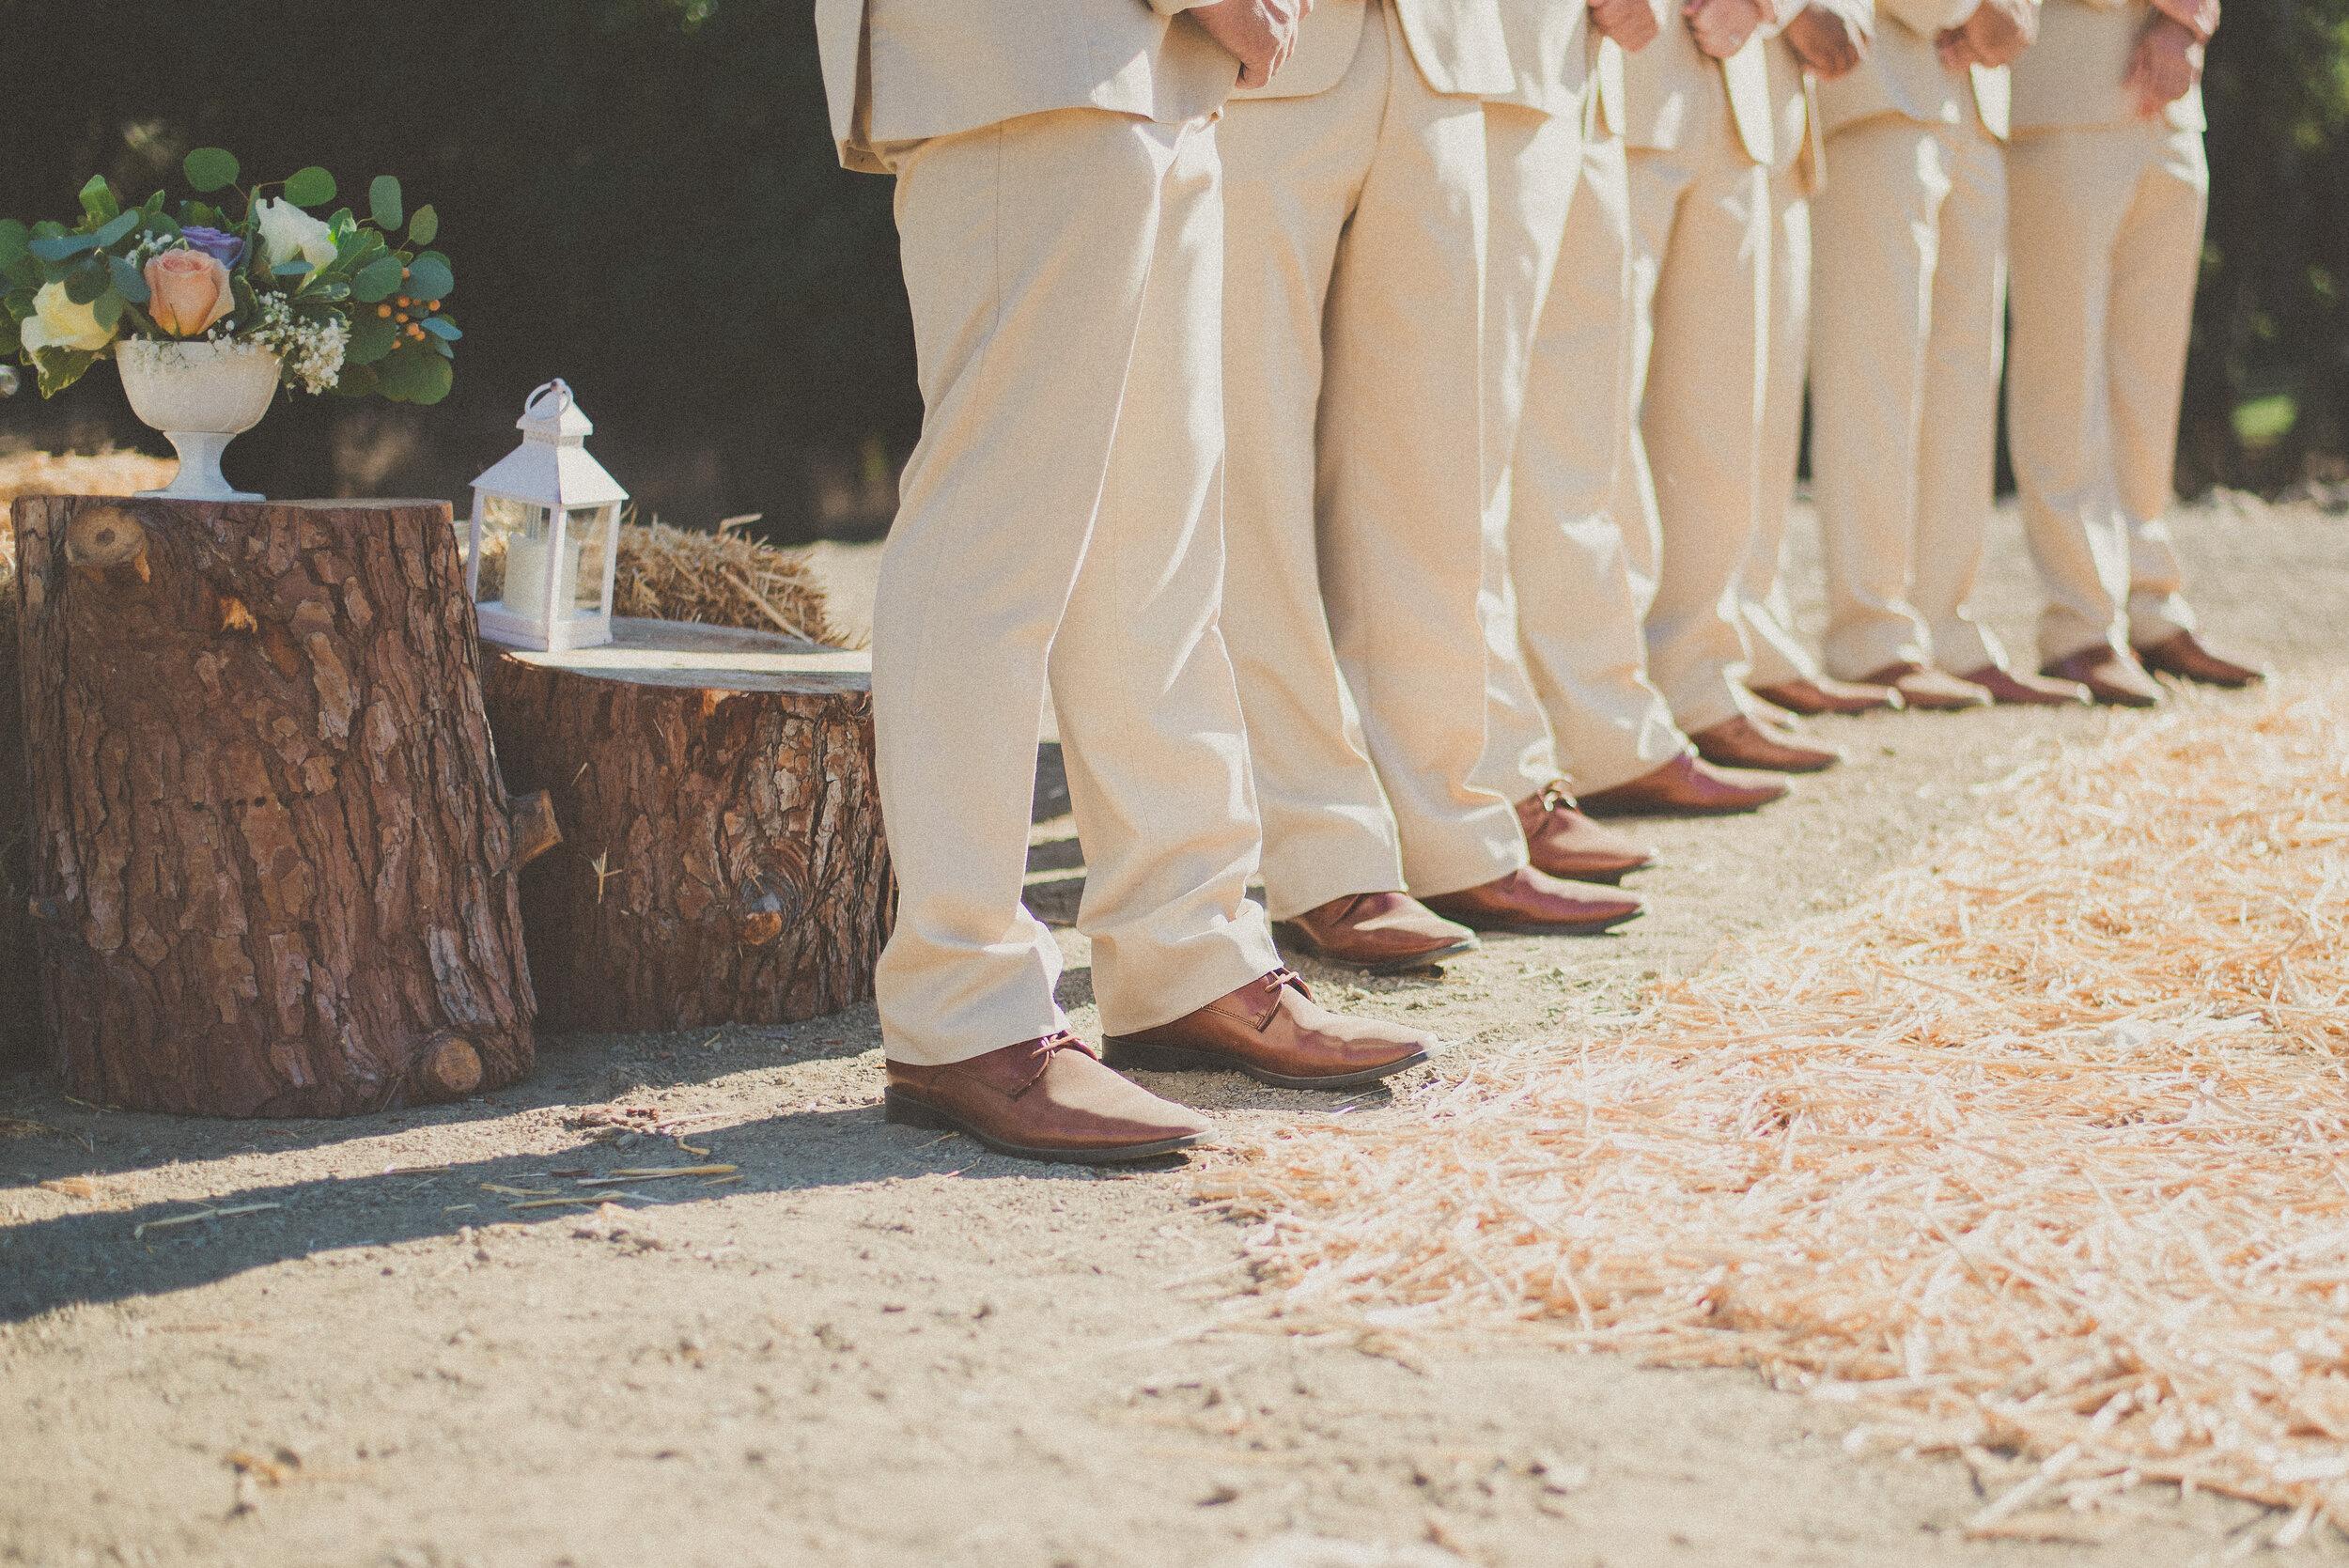 Roberts Wedding - Ceremony-30.jpg